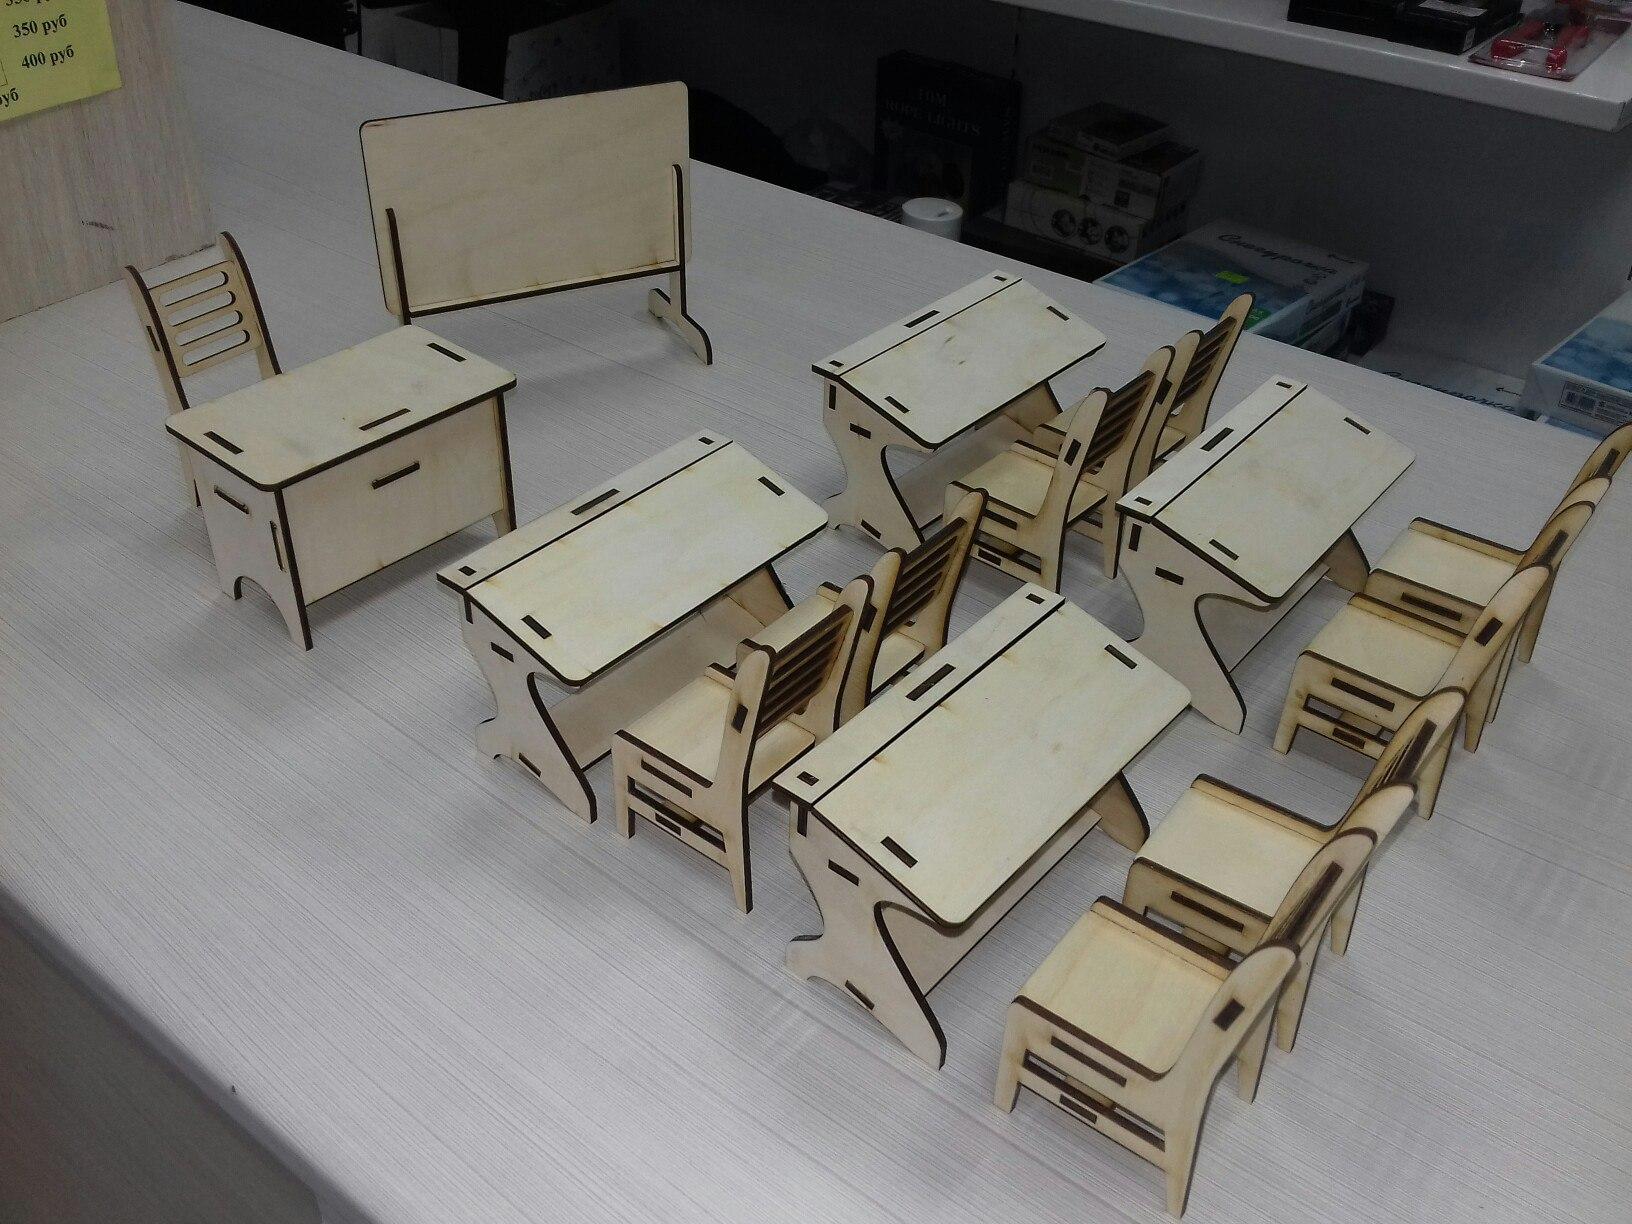 Laser Cut Miniature Classroom Furniture Free Vector